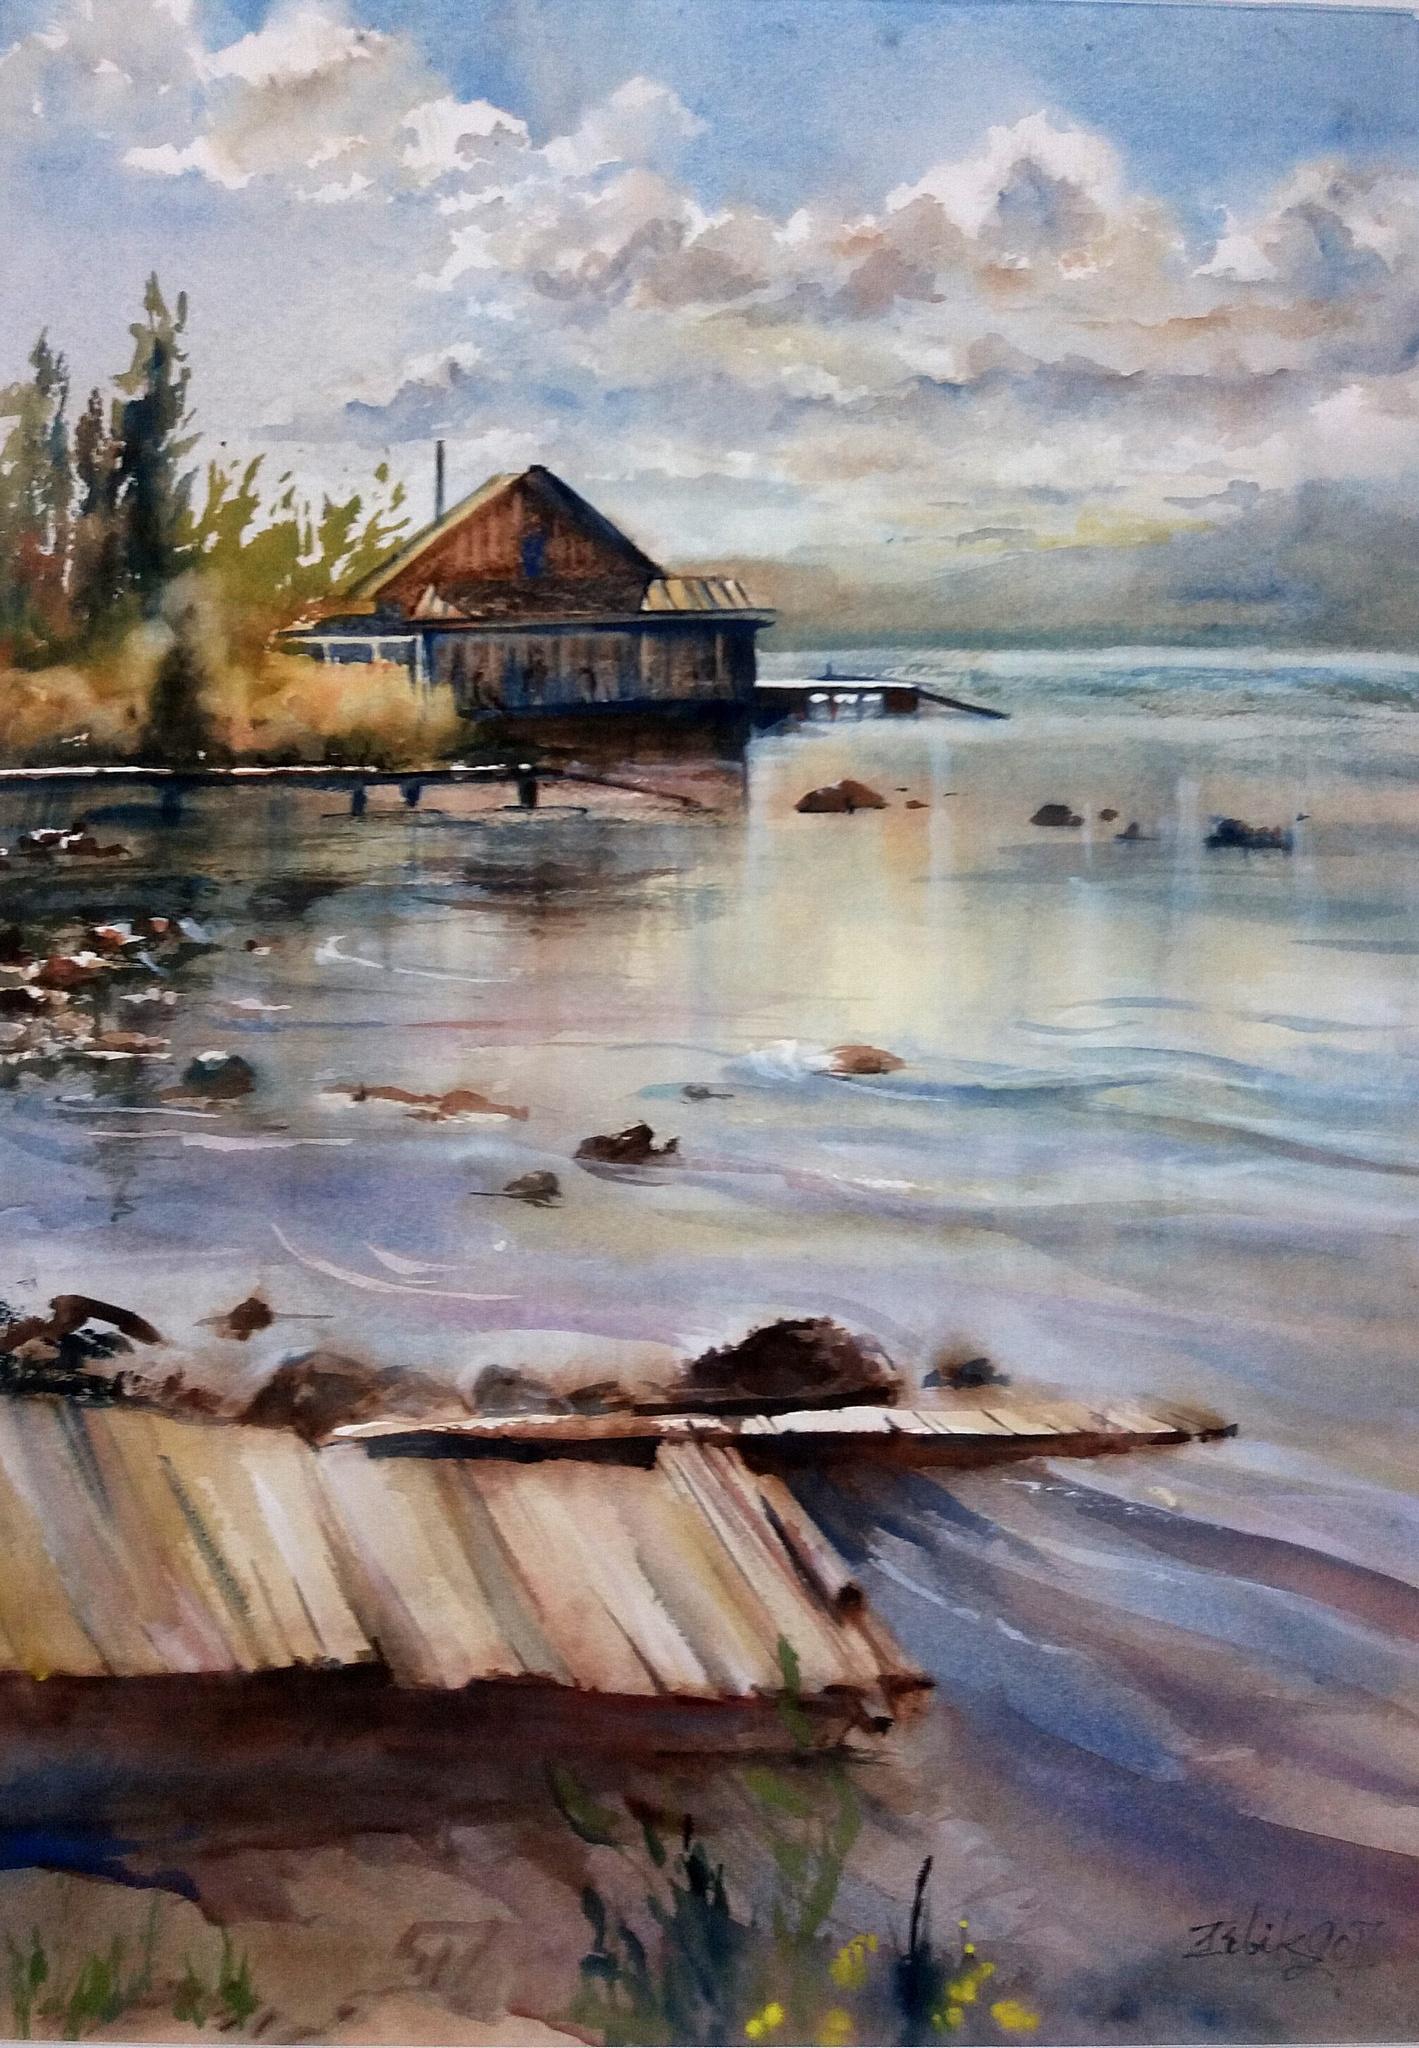 """Путешествия в акварелях"" Ирины Бибик-Чколян"